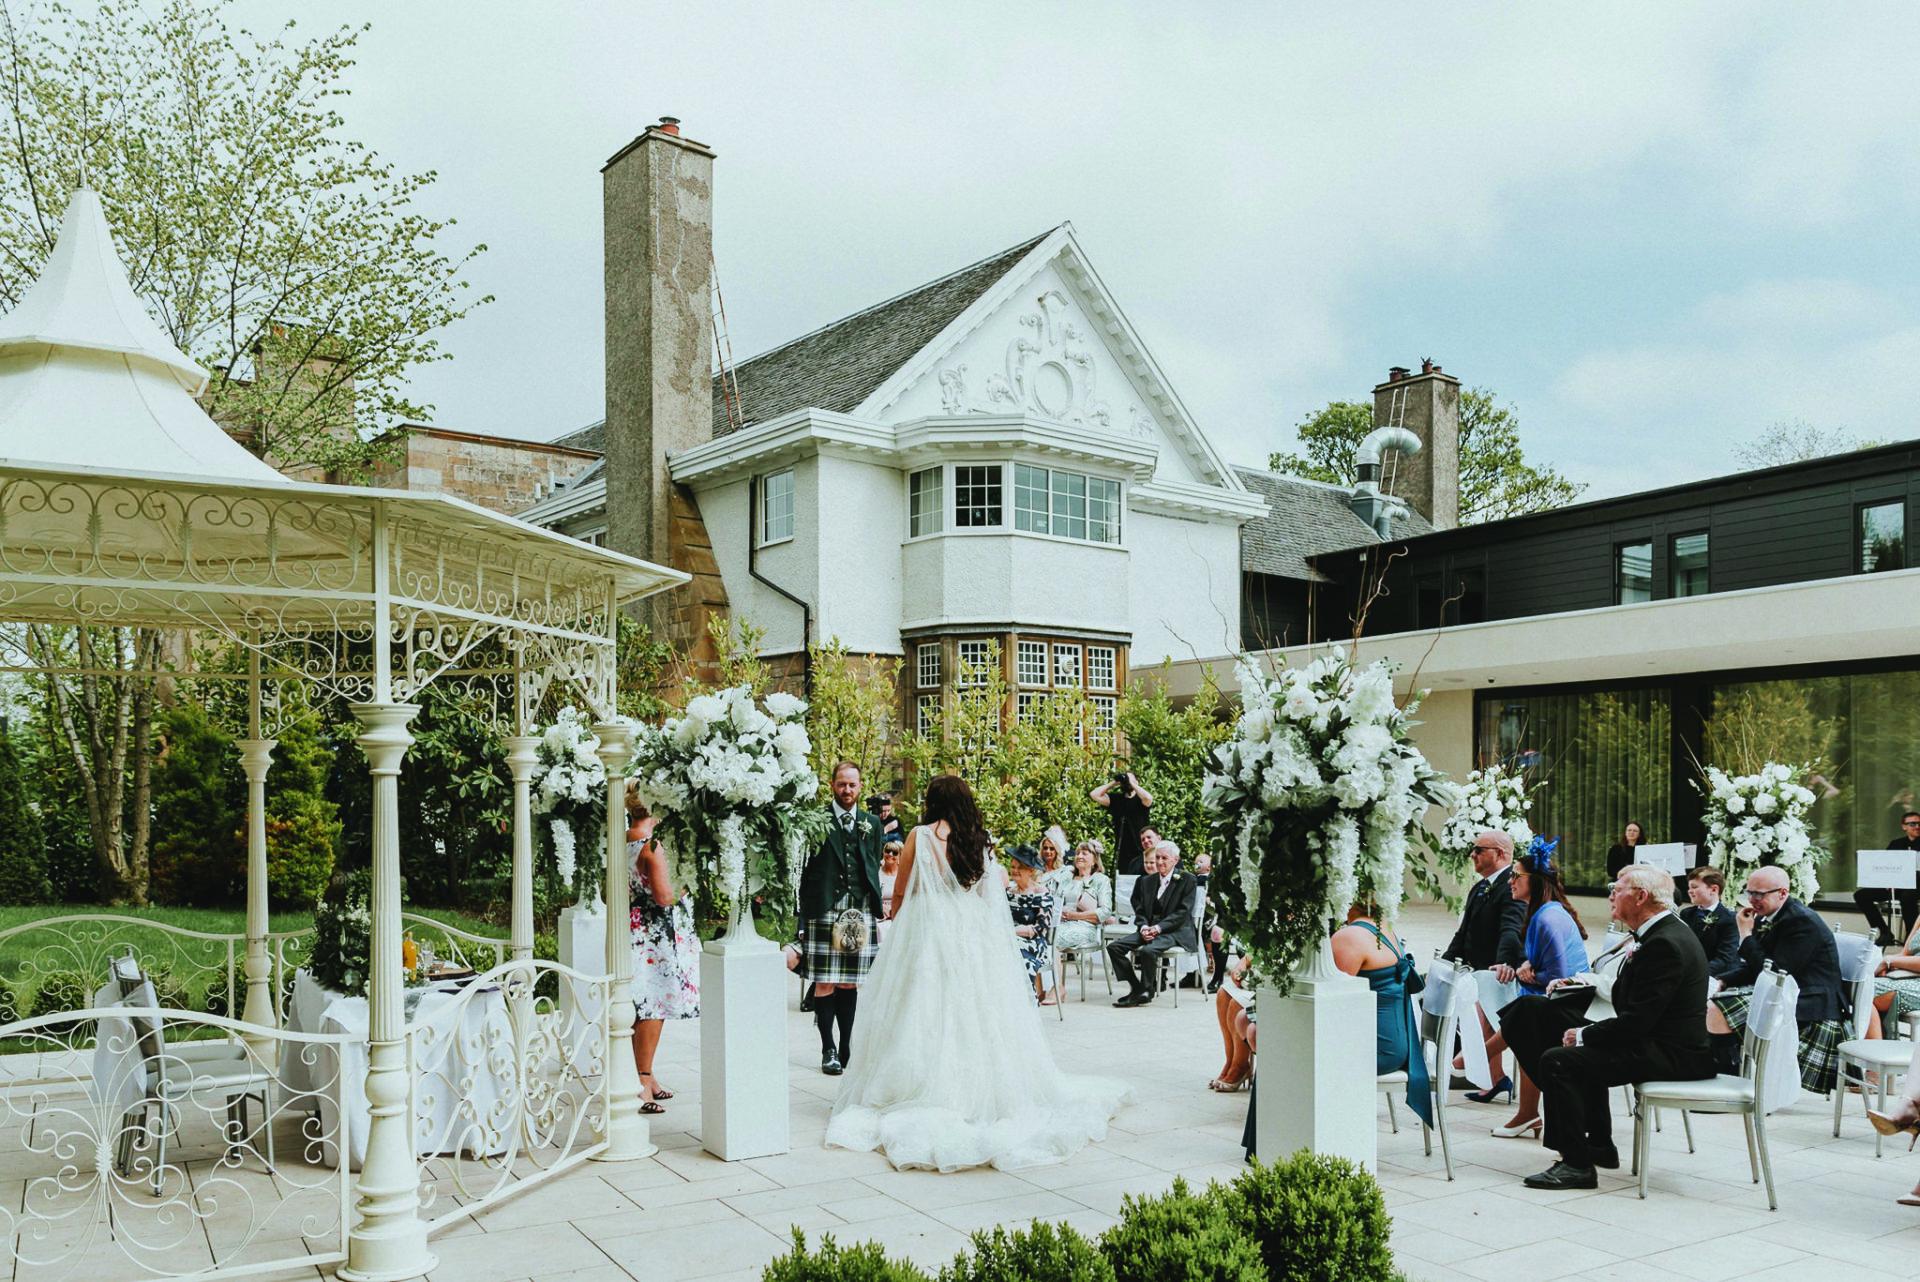 Dalmeny Outdoor Wedding